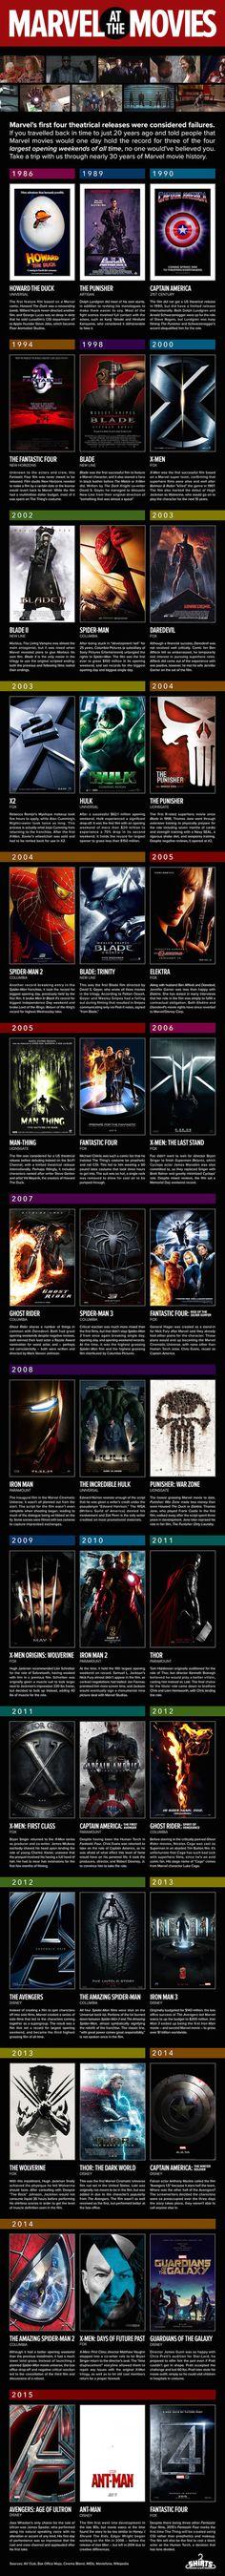 marvel-movies-infographic-144814